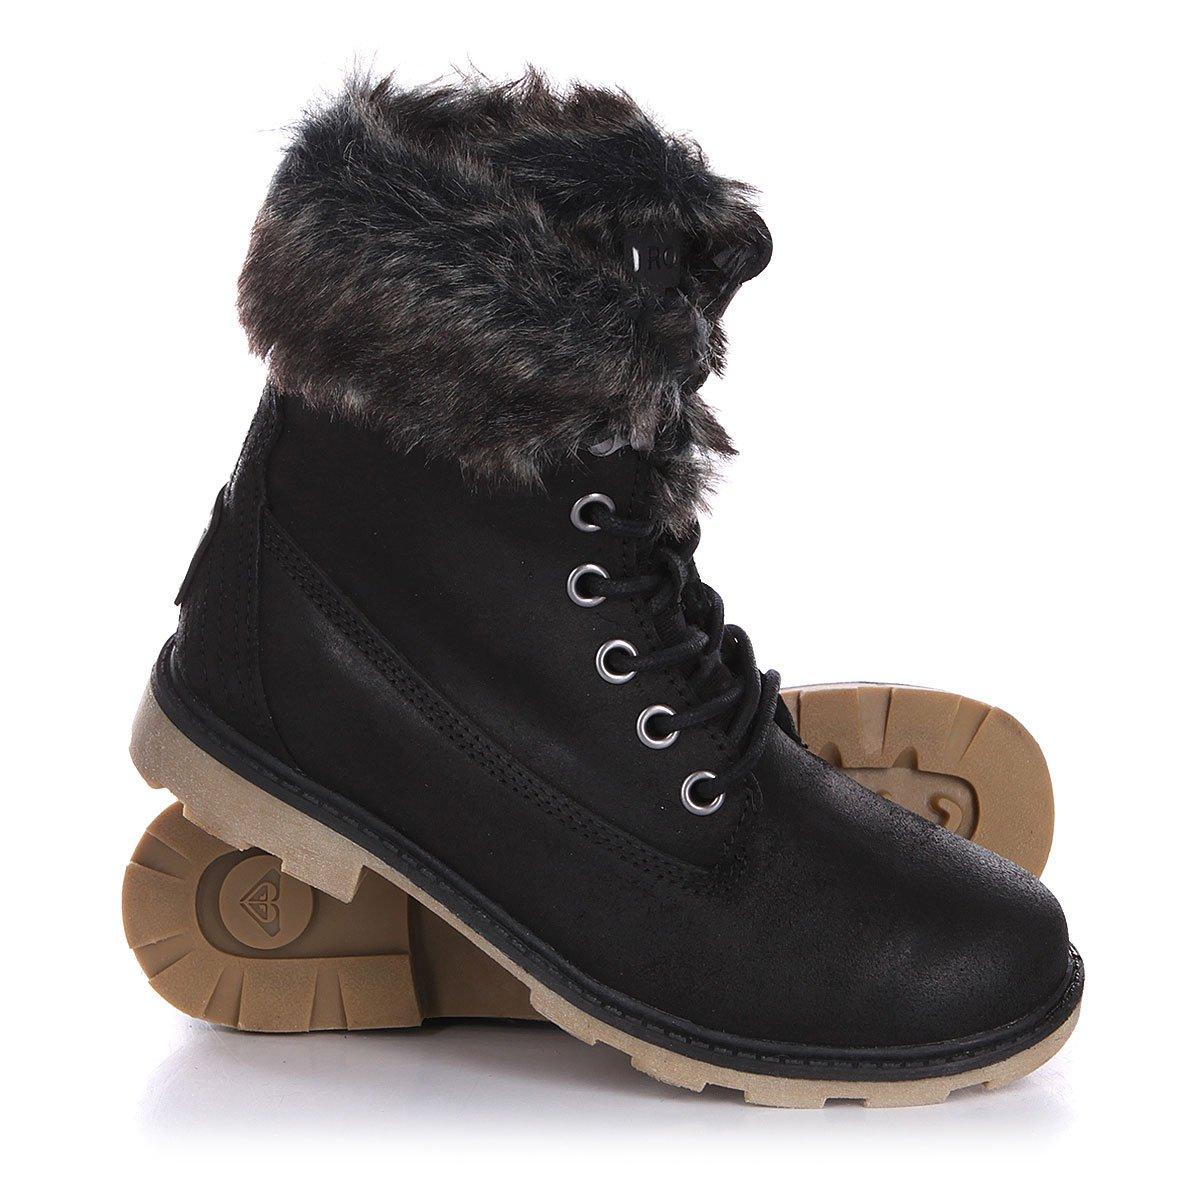 02953f073e01 Купить ботинки зимние женские Roxy Timber J Boot Black (ARJB700250 ...